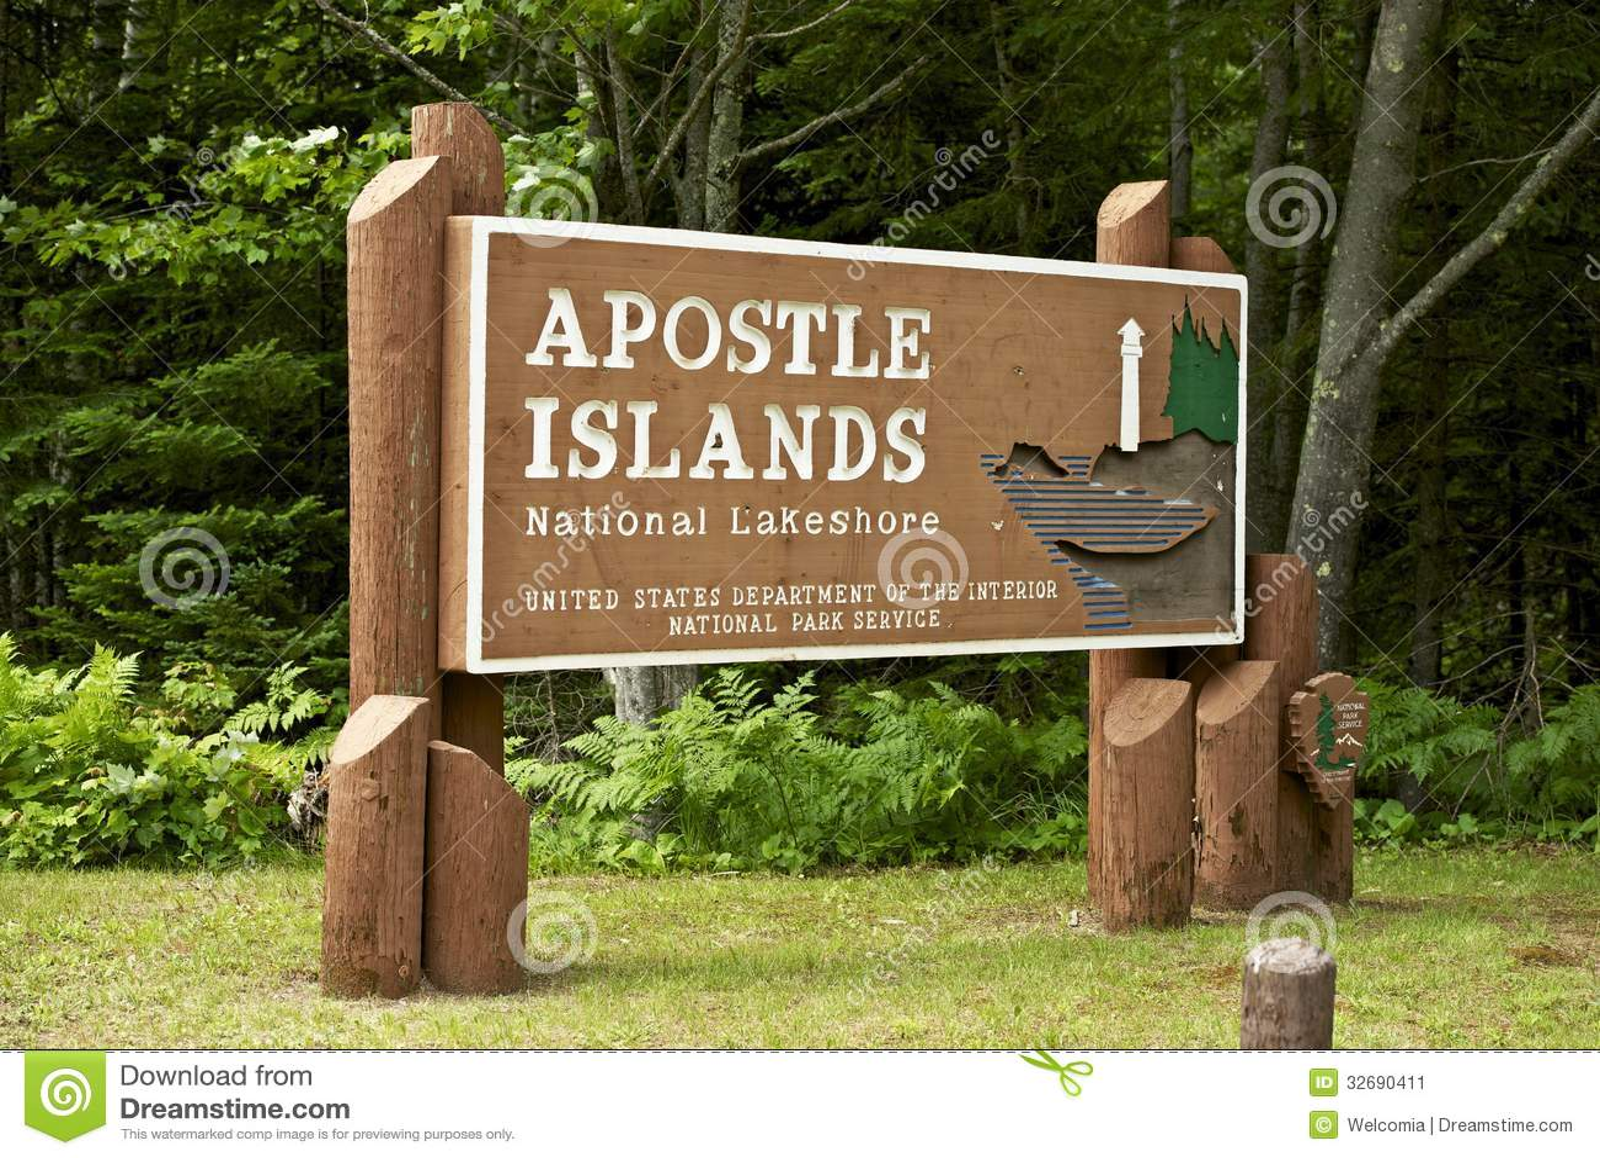 Apostle Islands Stock Image Image 32690411